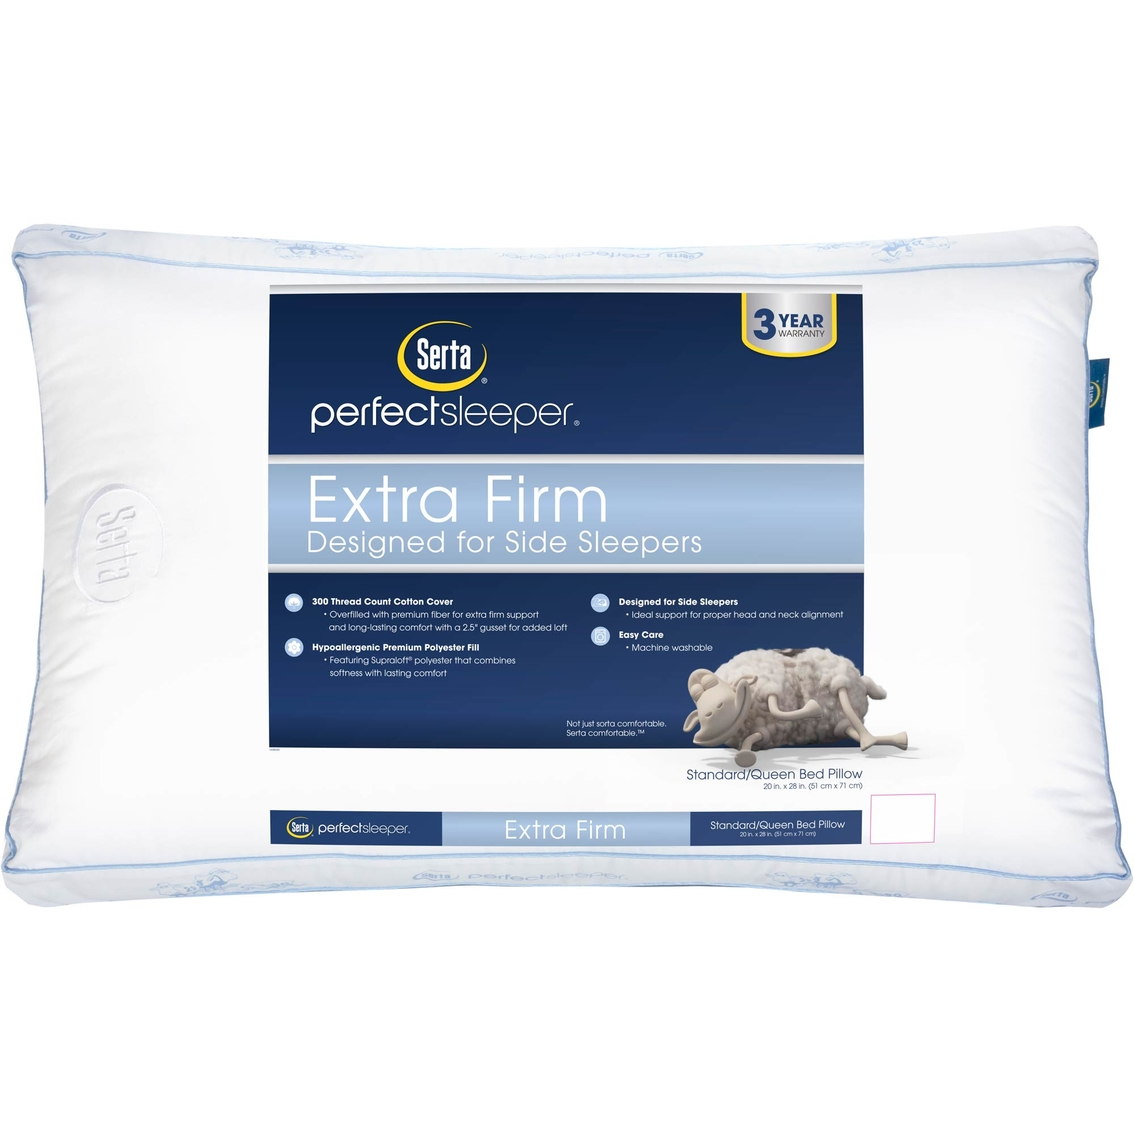 serta perfect sleeper extra firm pillow